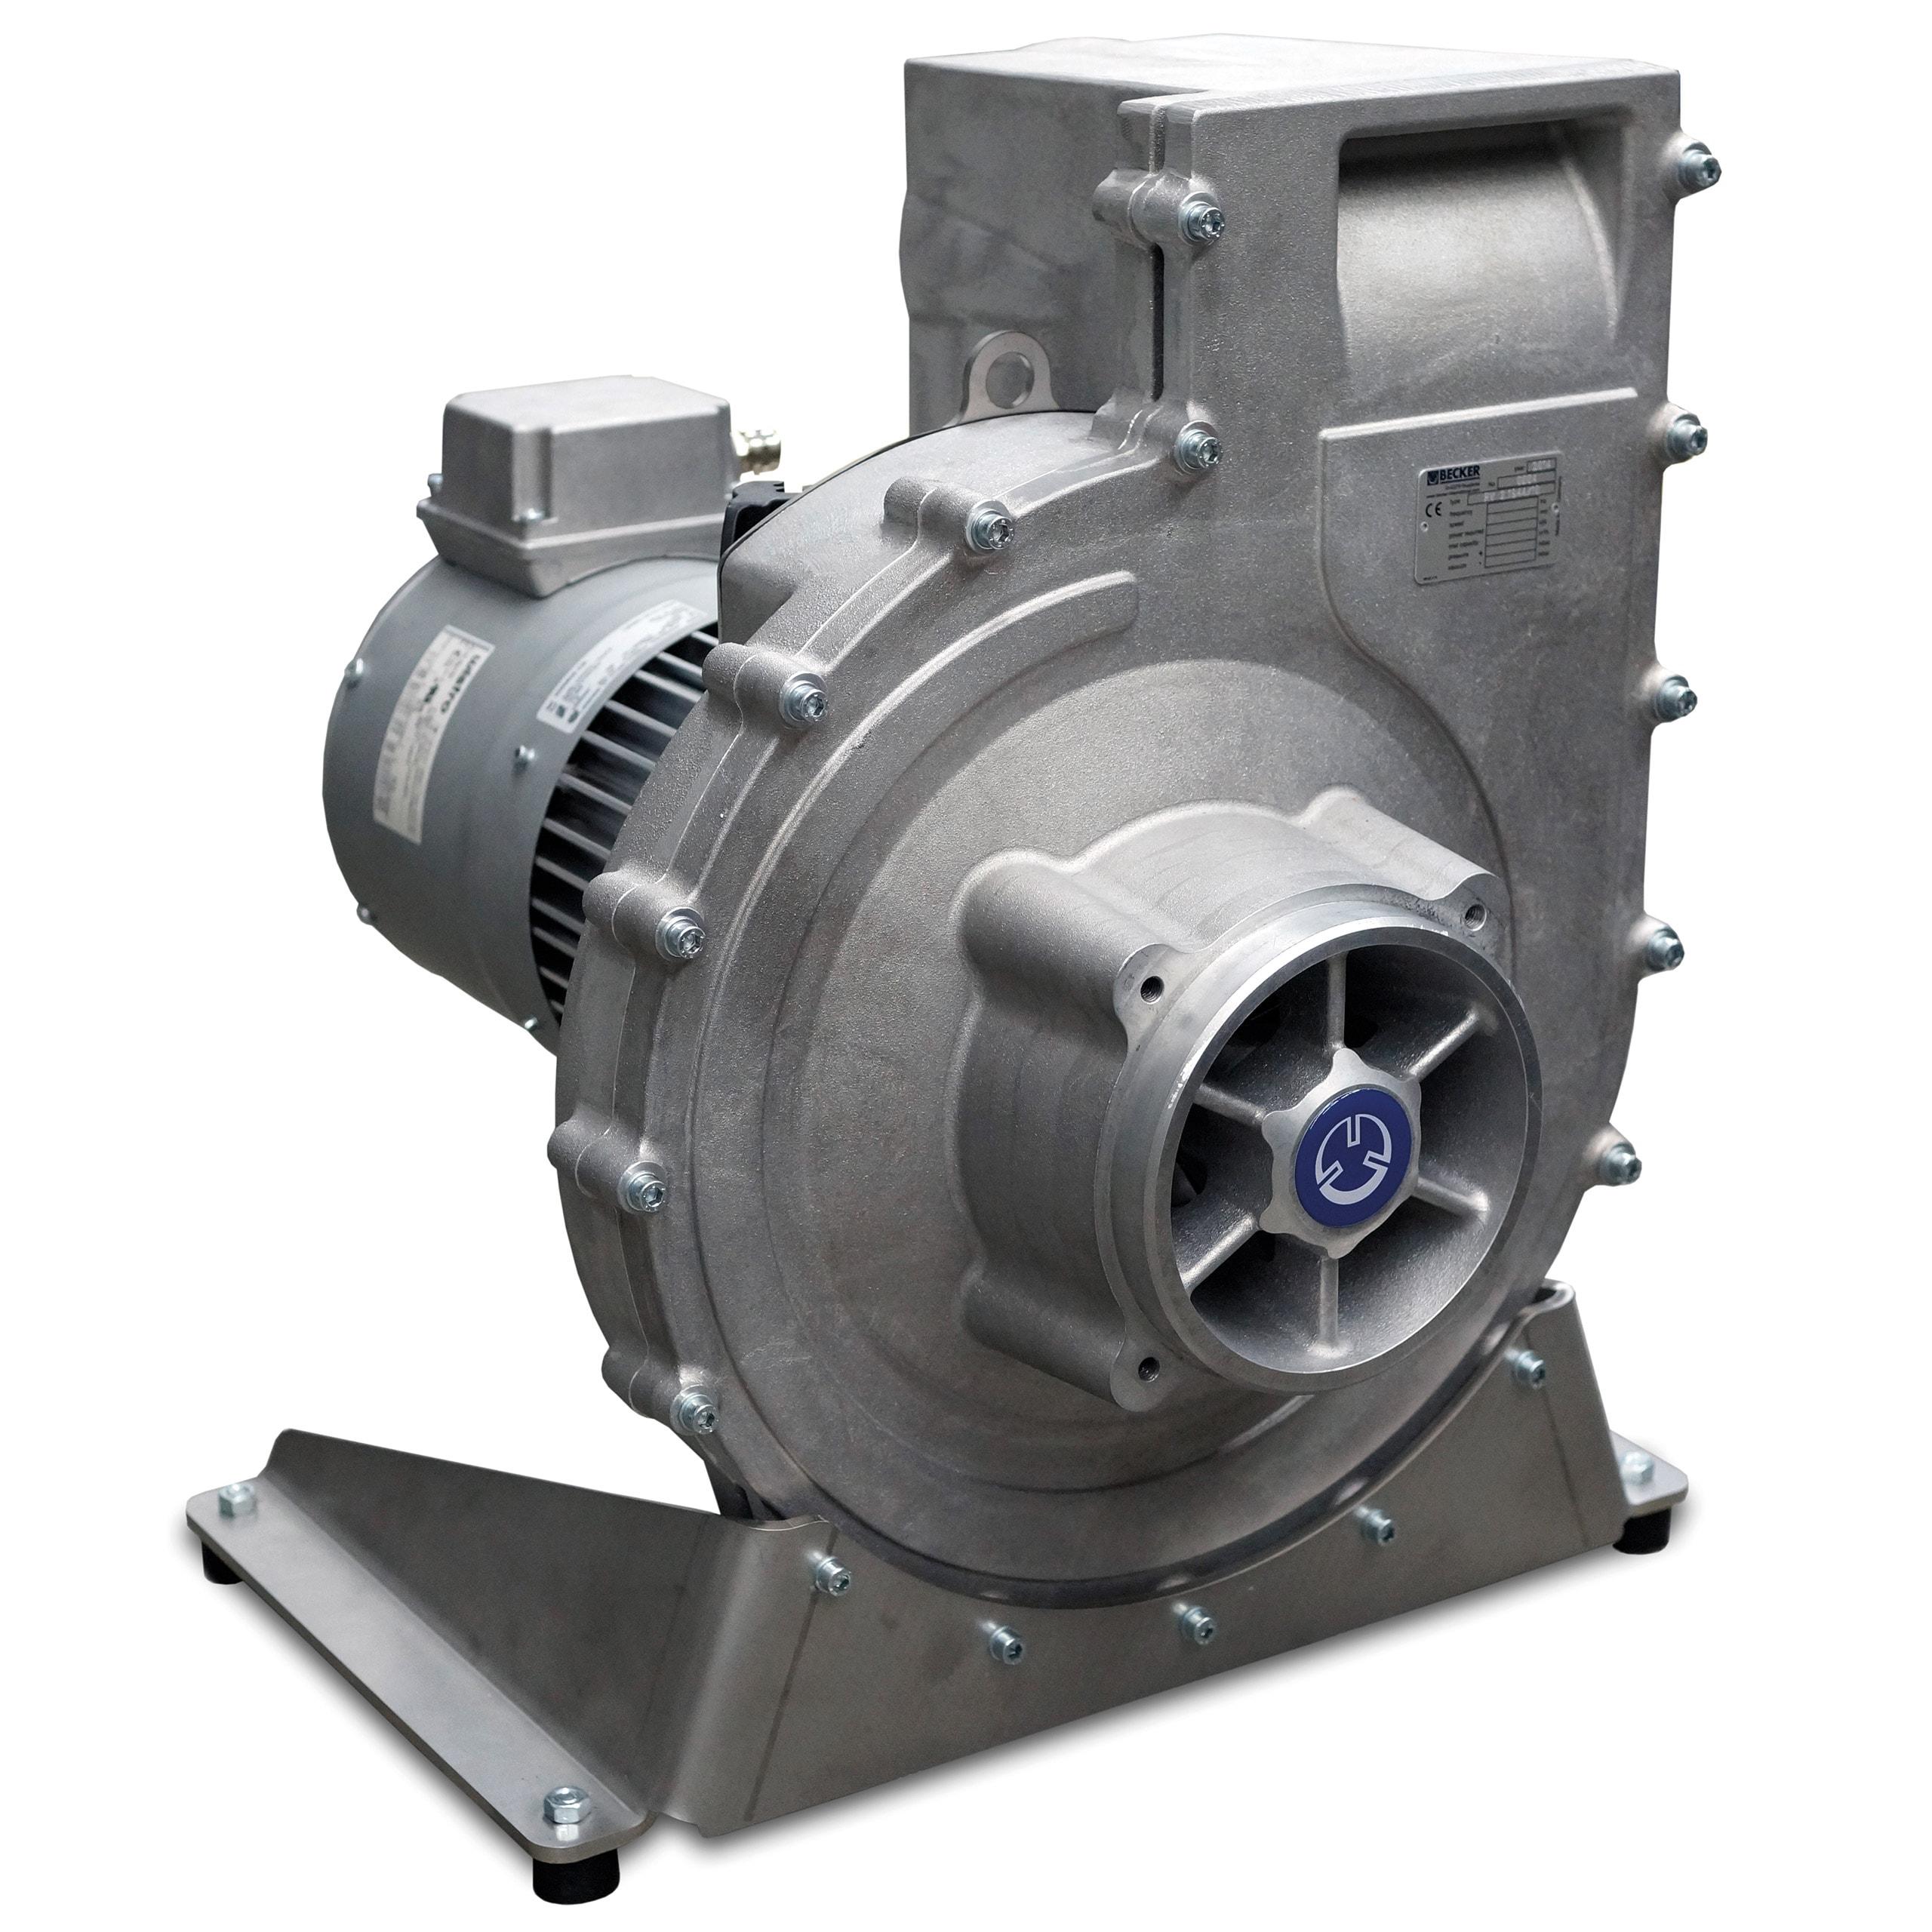 rv 2 1944hj38C2W3dERD1 - GE Nuovo Pignone (Нуово Пиньоне) компрессоры, турбины